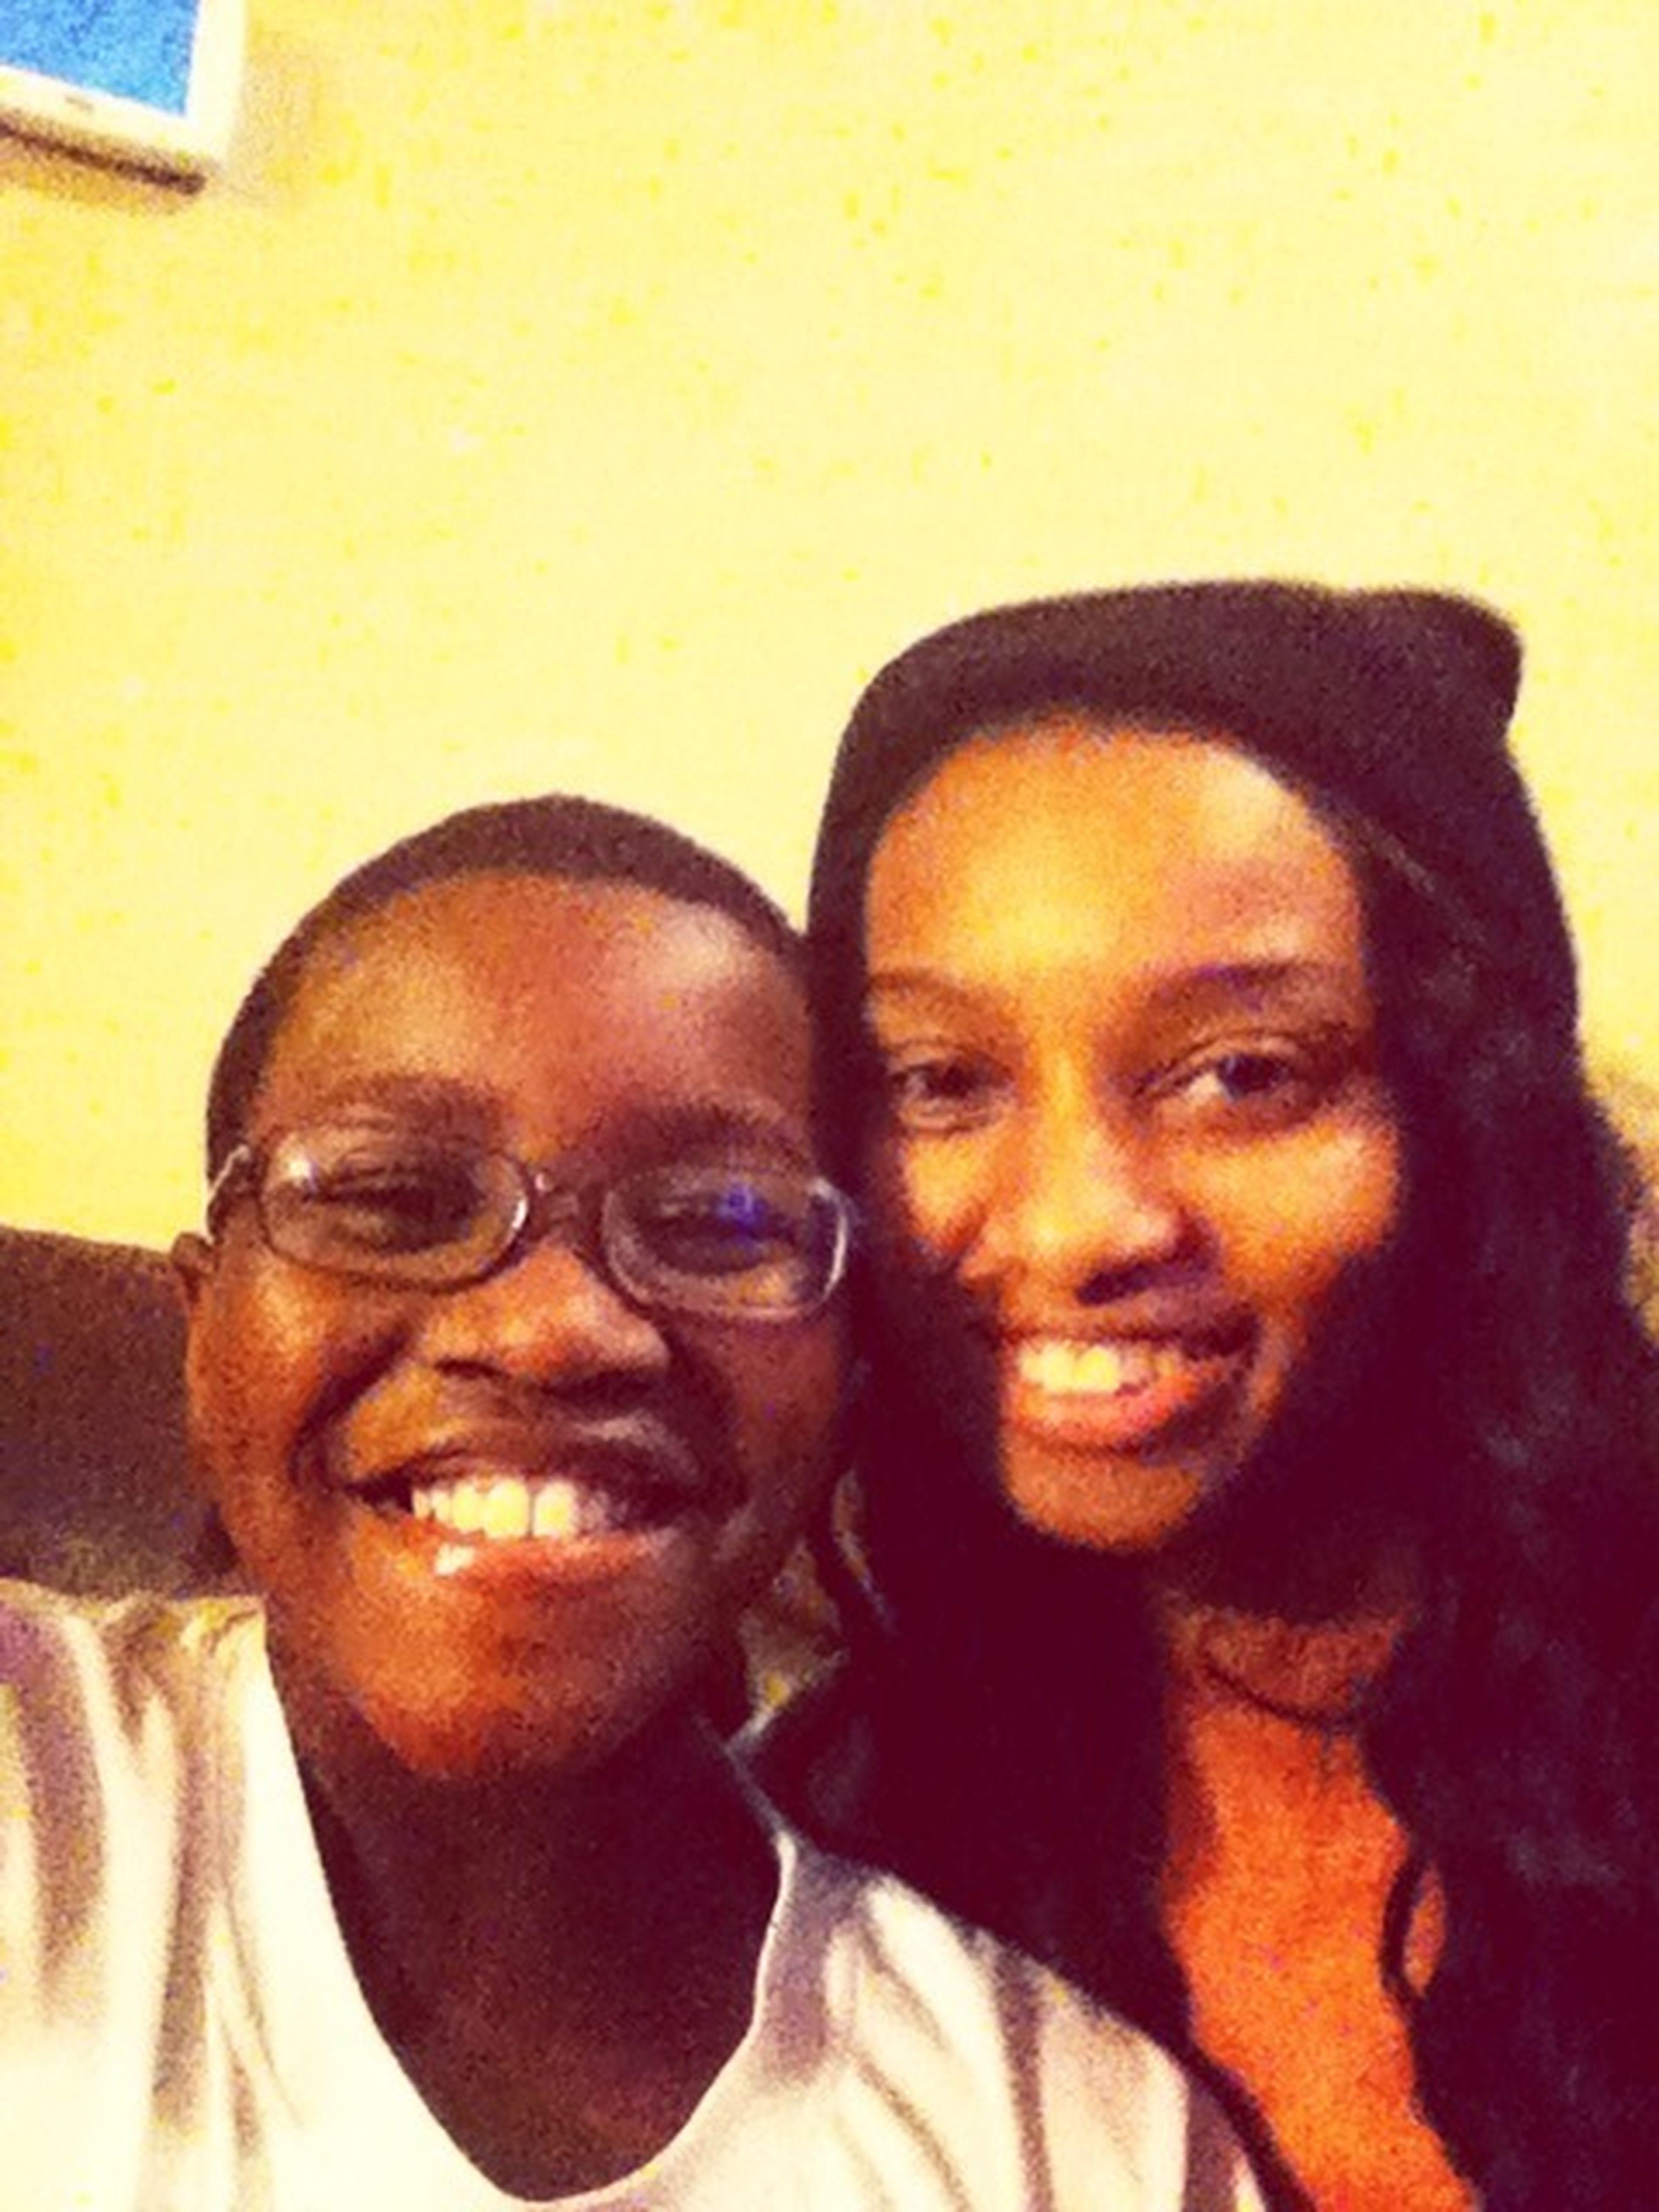 Me And ZeeMan Lol